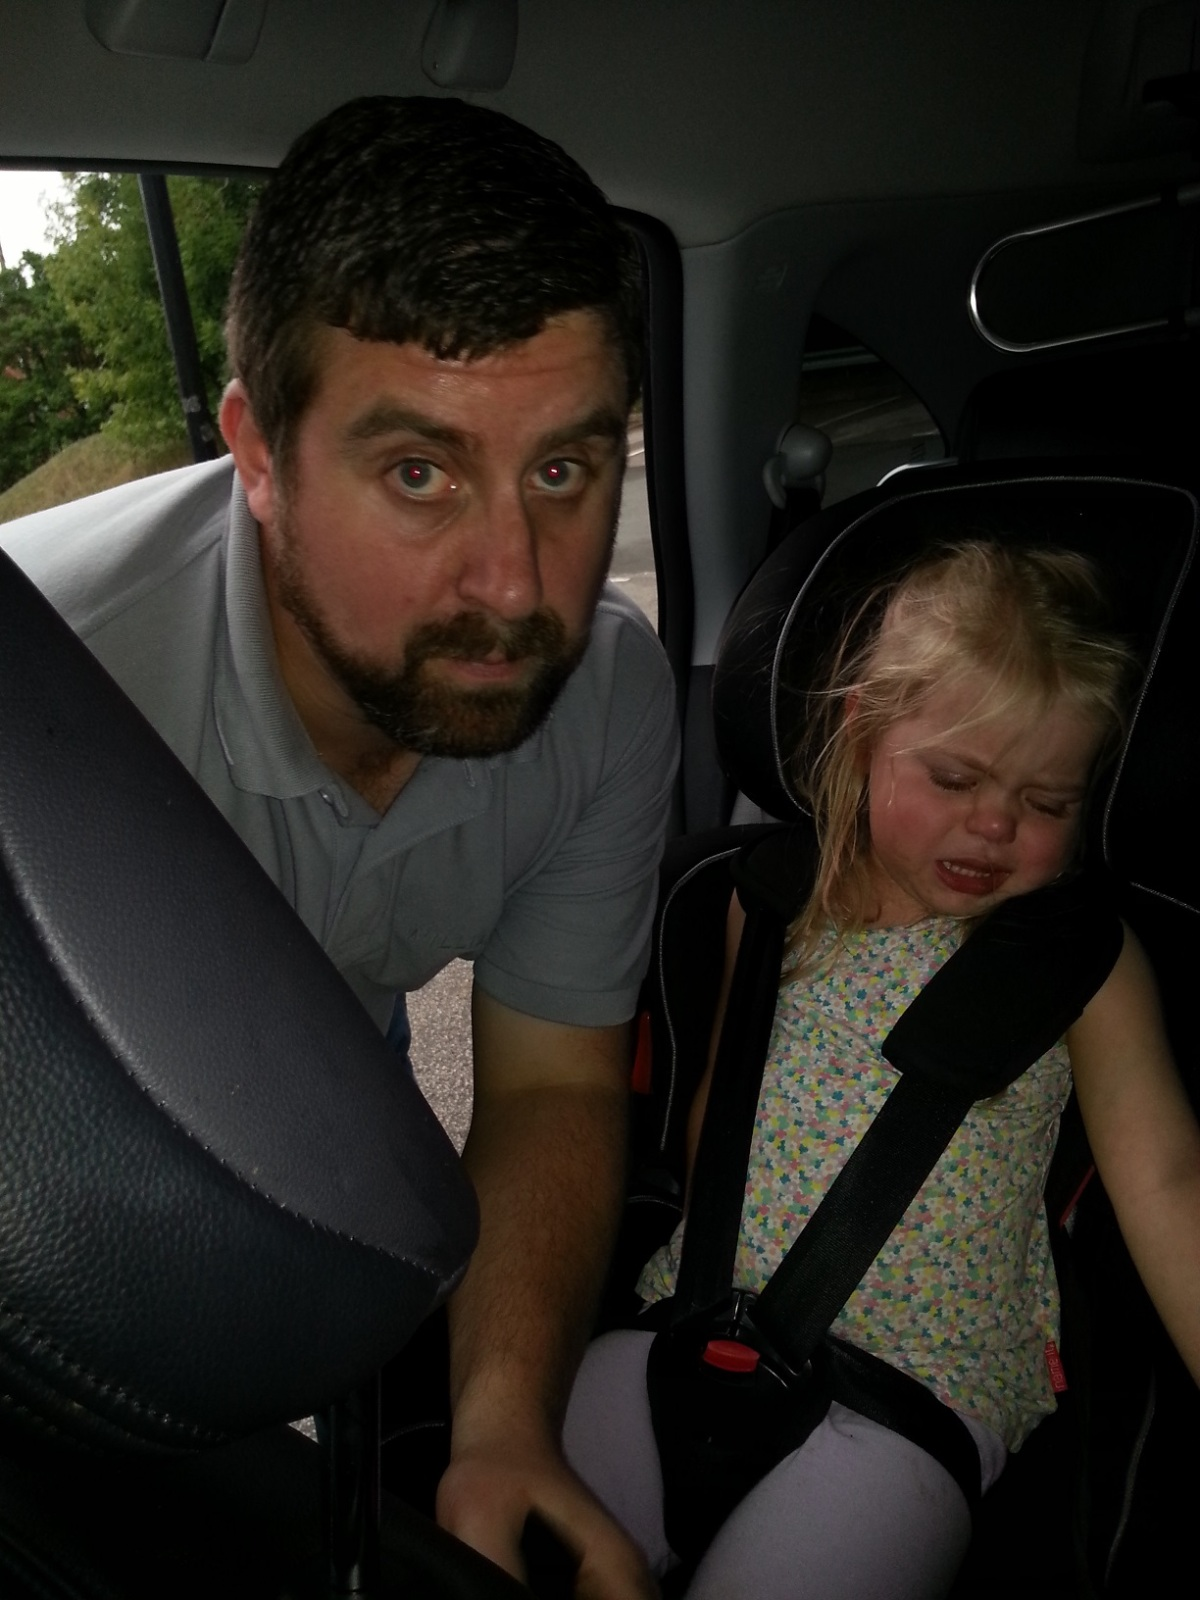 The Seatbelt Standoff